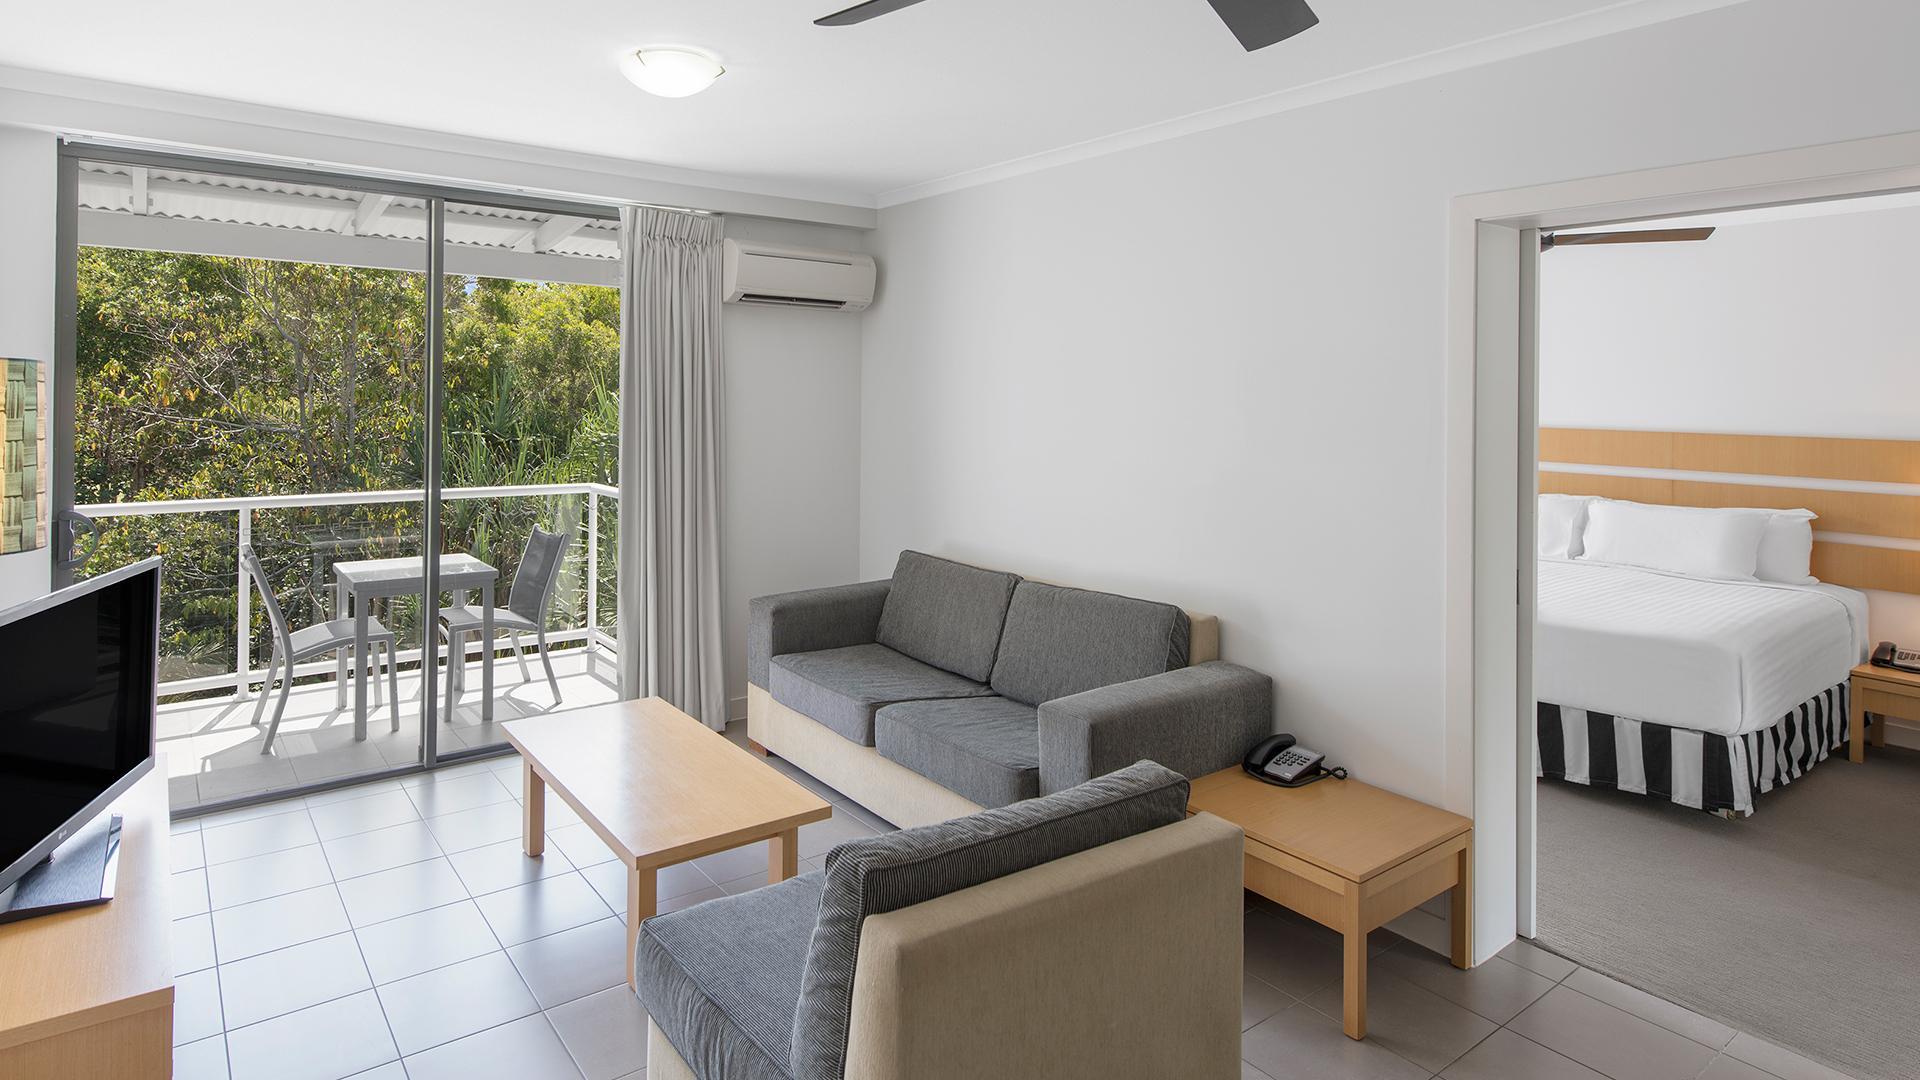 One-Bedroom Garden View Apartment image 1 at Oaks Port Douglas Resort May 2020 by Douglas Shire, Queensland, Australia